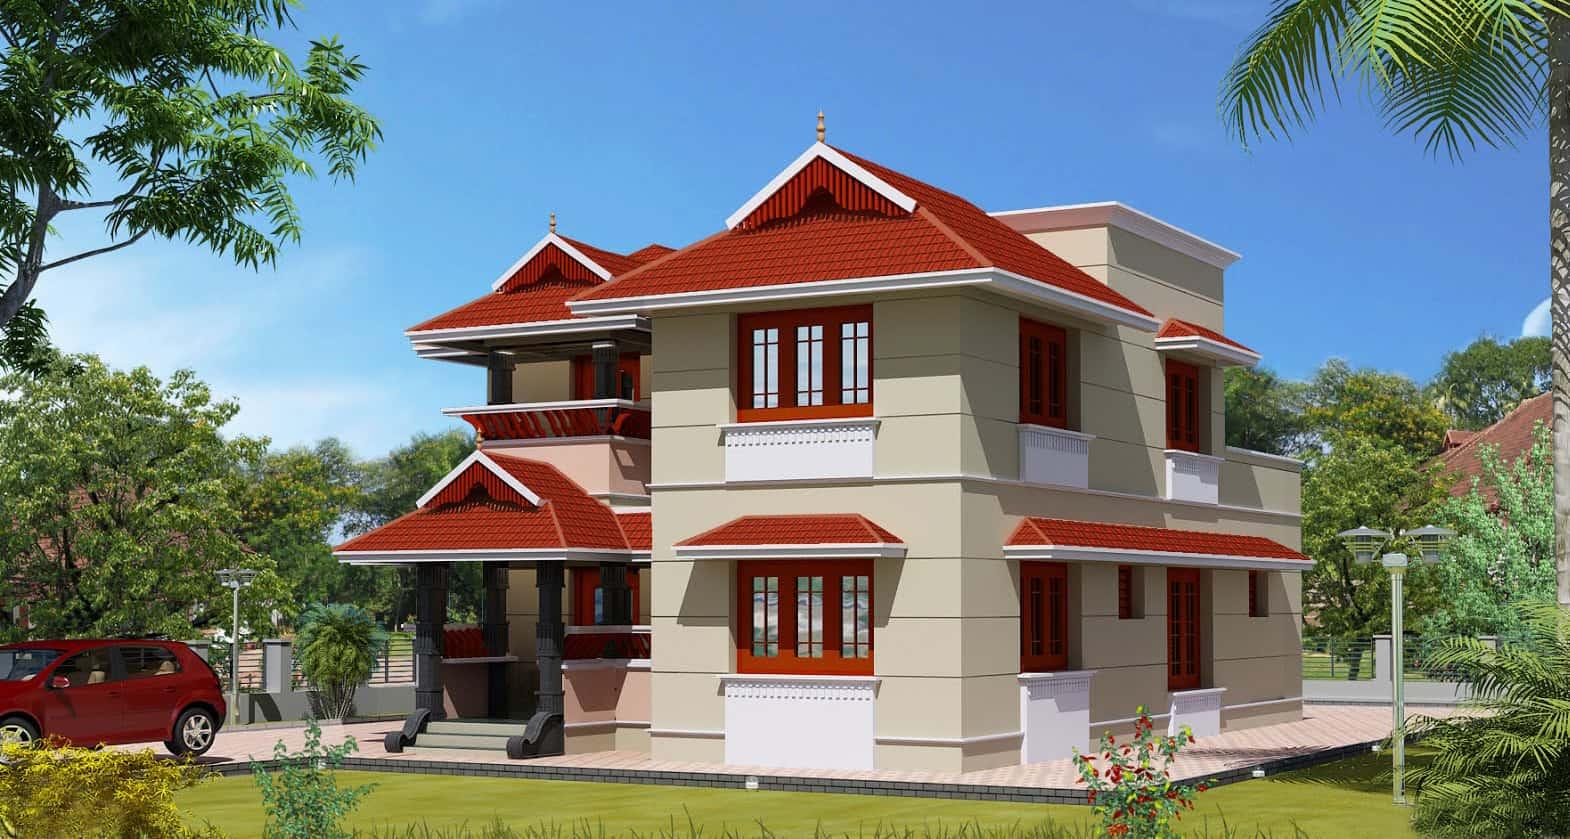 Modern kerala house design 2013 at 2980 for Kerala home design 2013